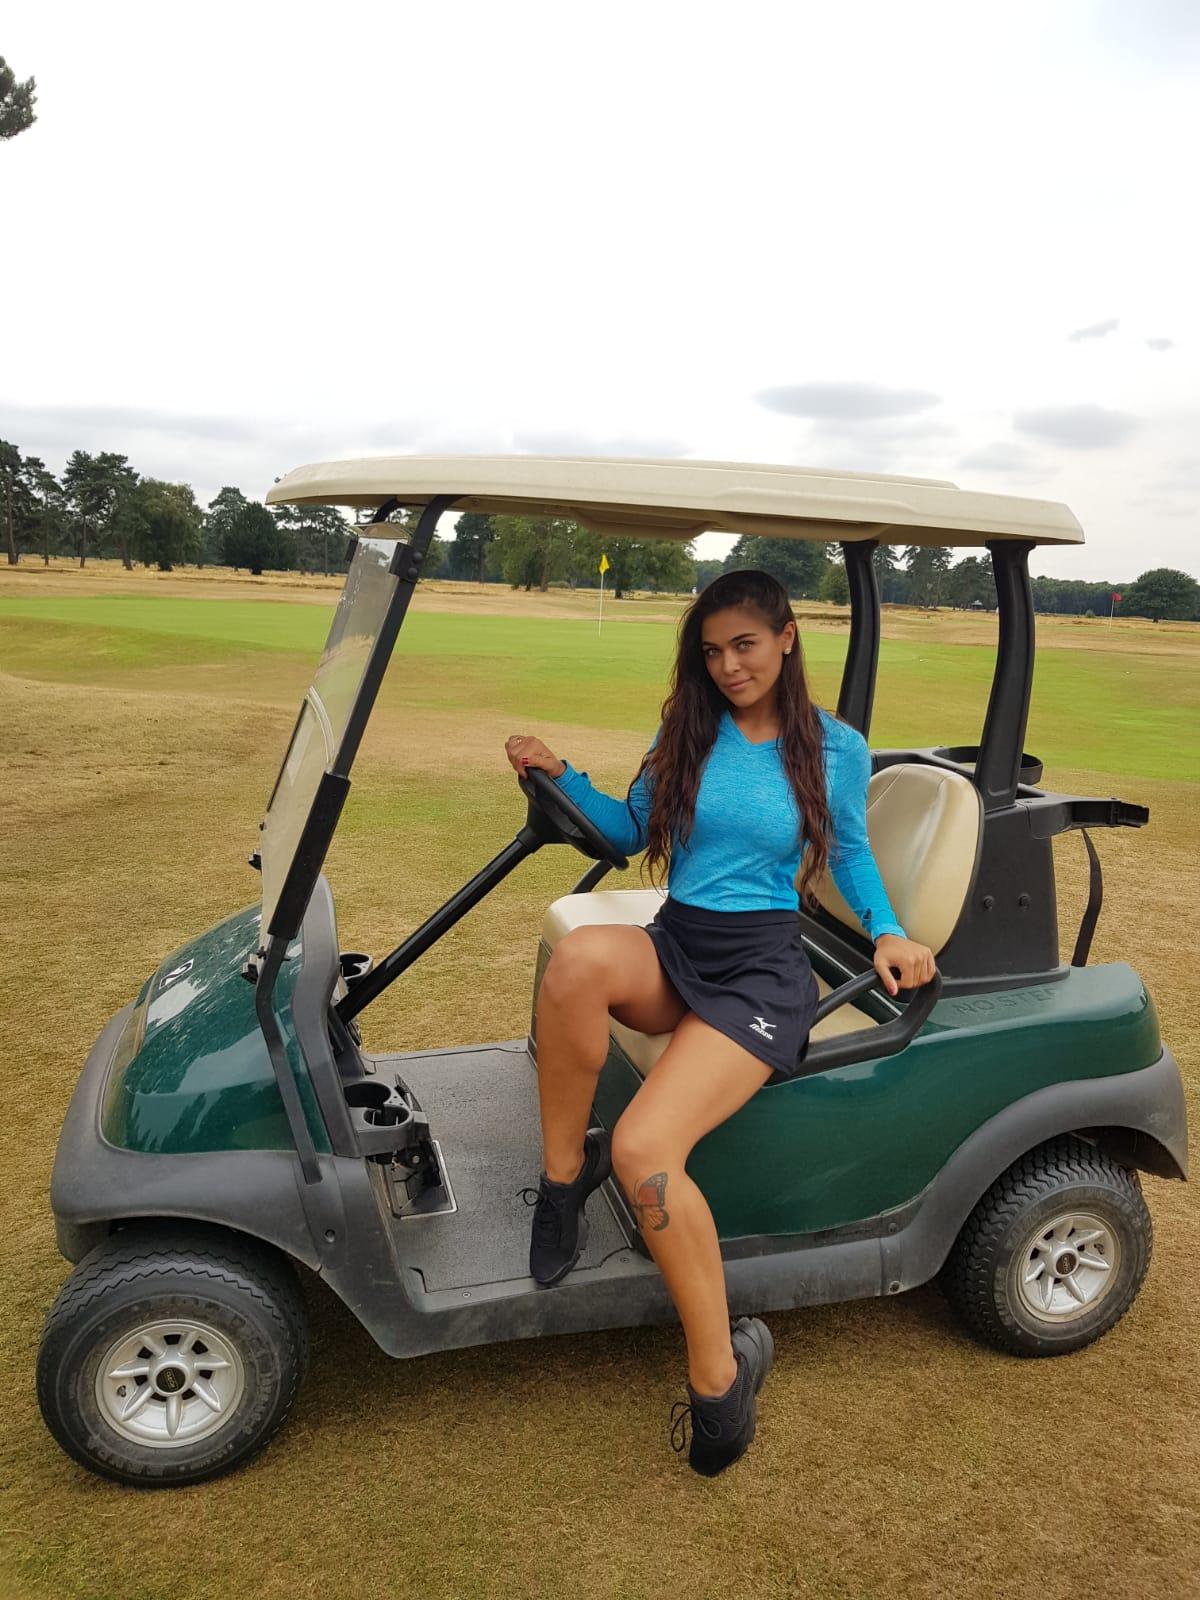 Golf Hostess with Mizuno Golf Pairs at Walton Heath Golf Course on 20th July